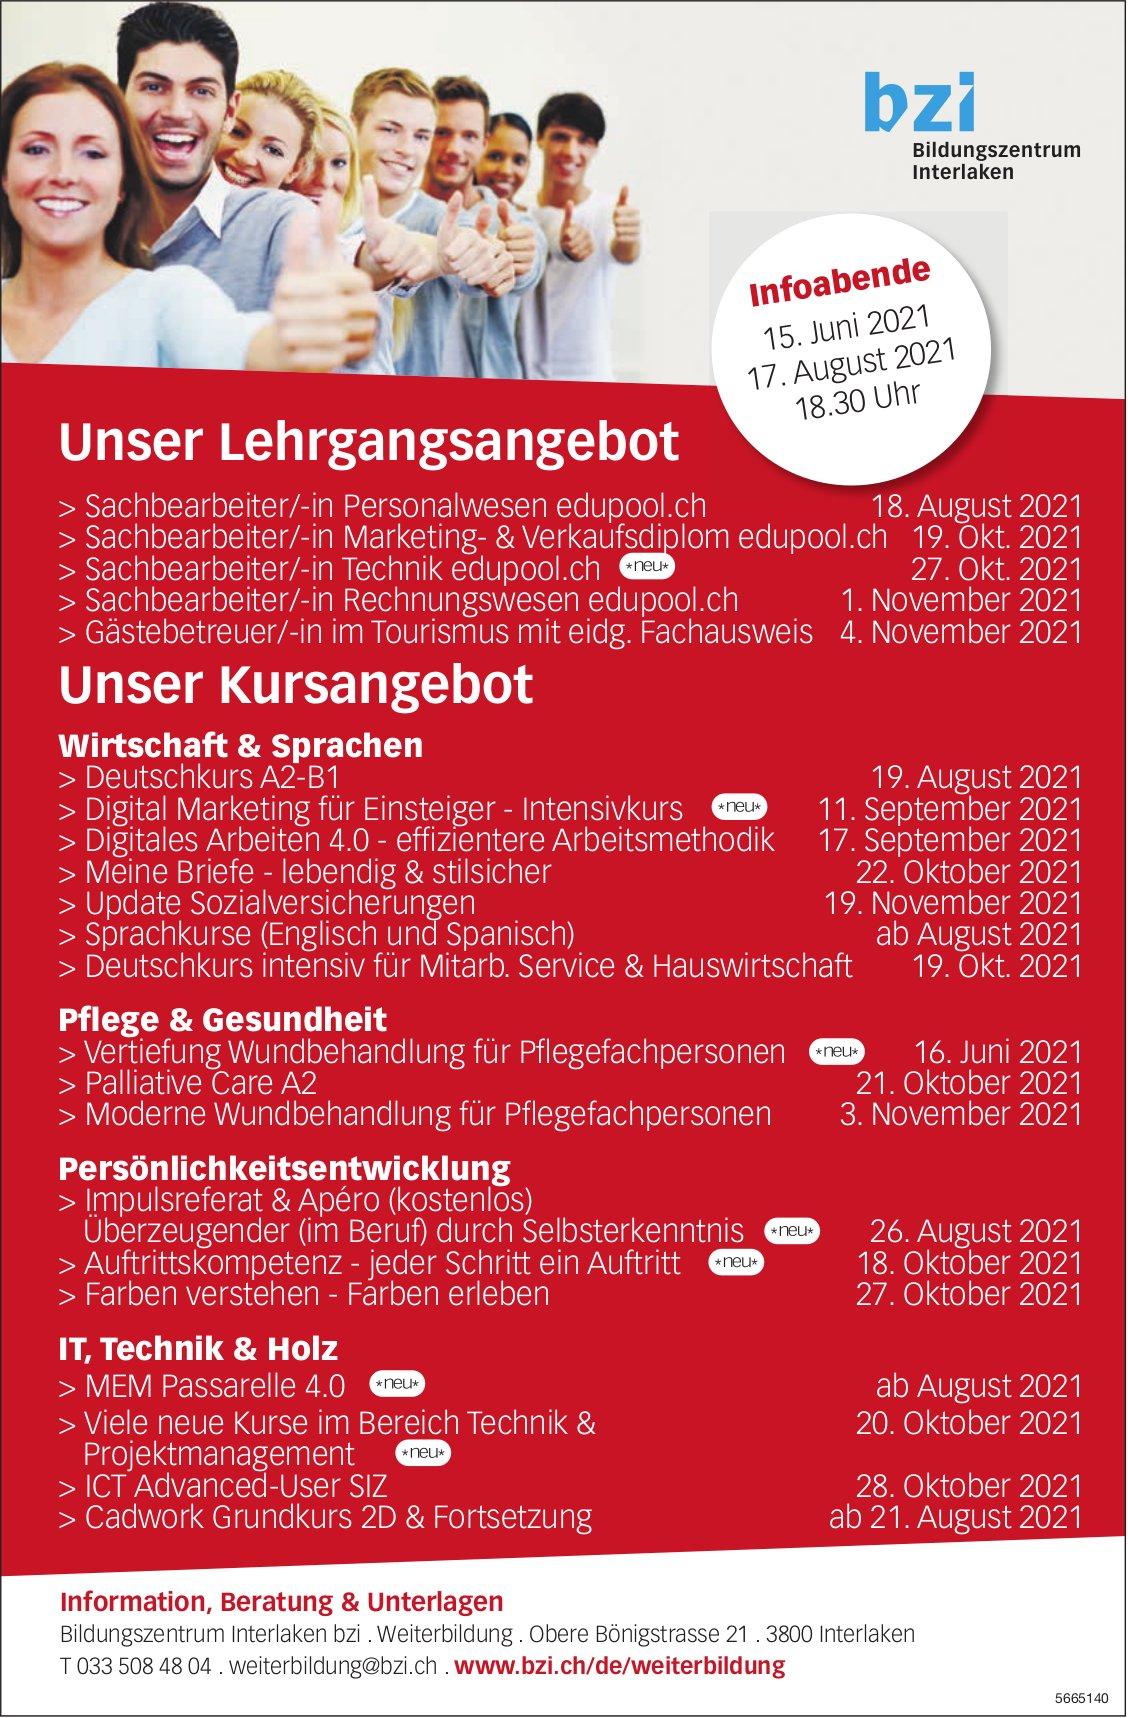 Bzi, Interlaken - Unser Lehrgangsangebot